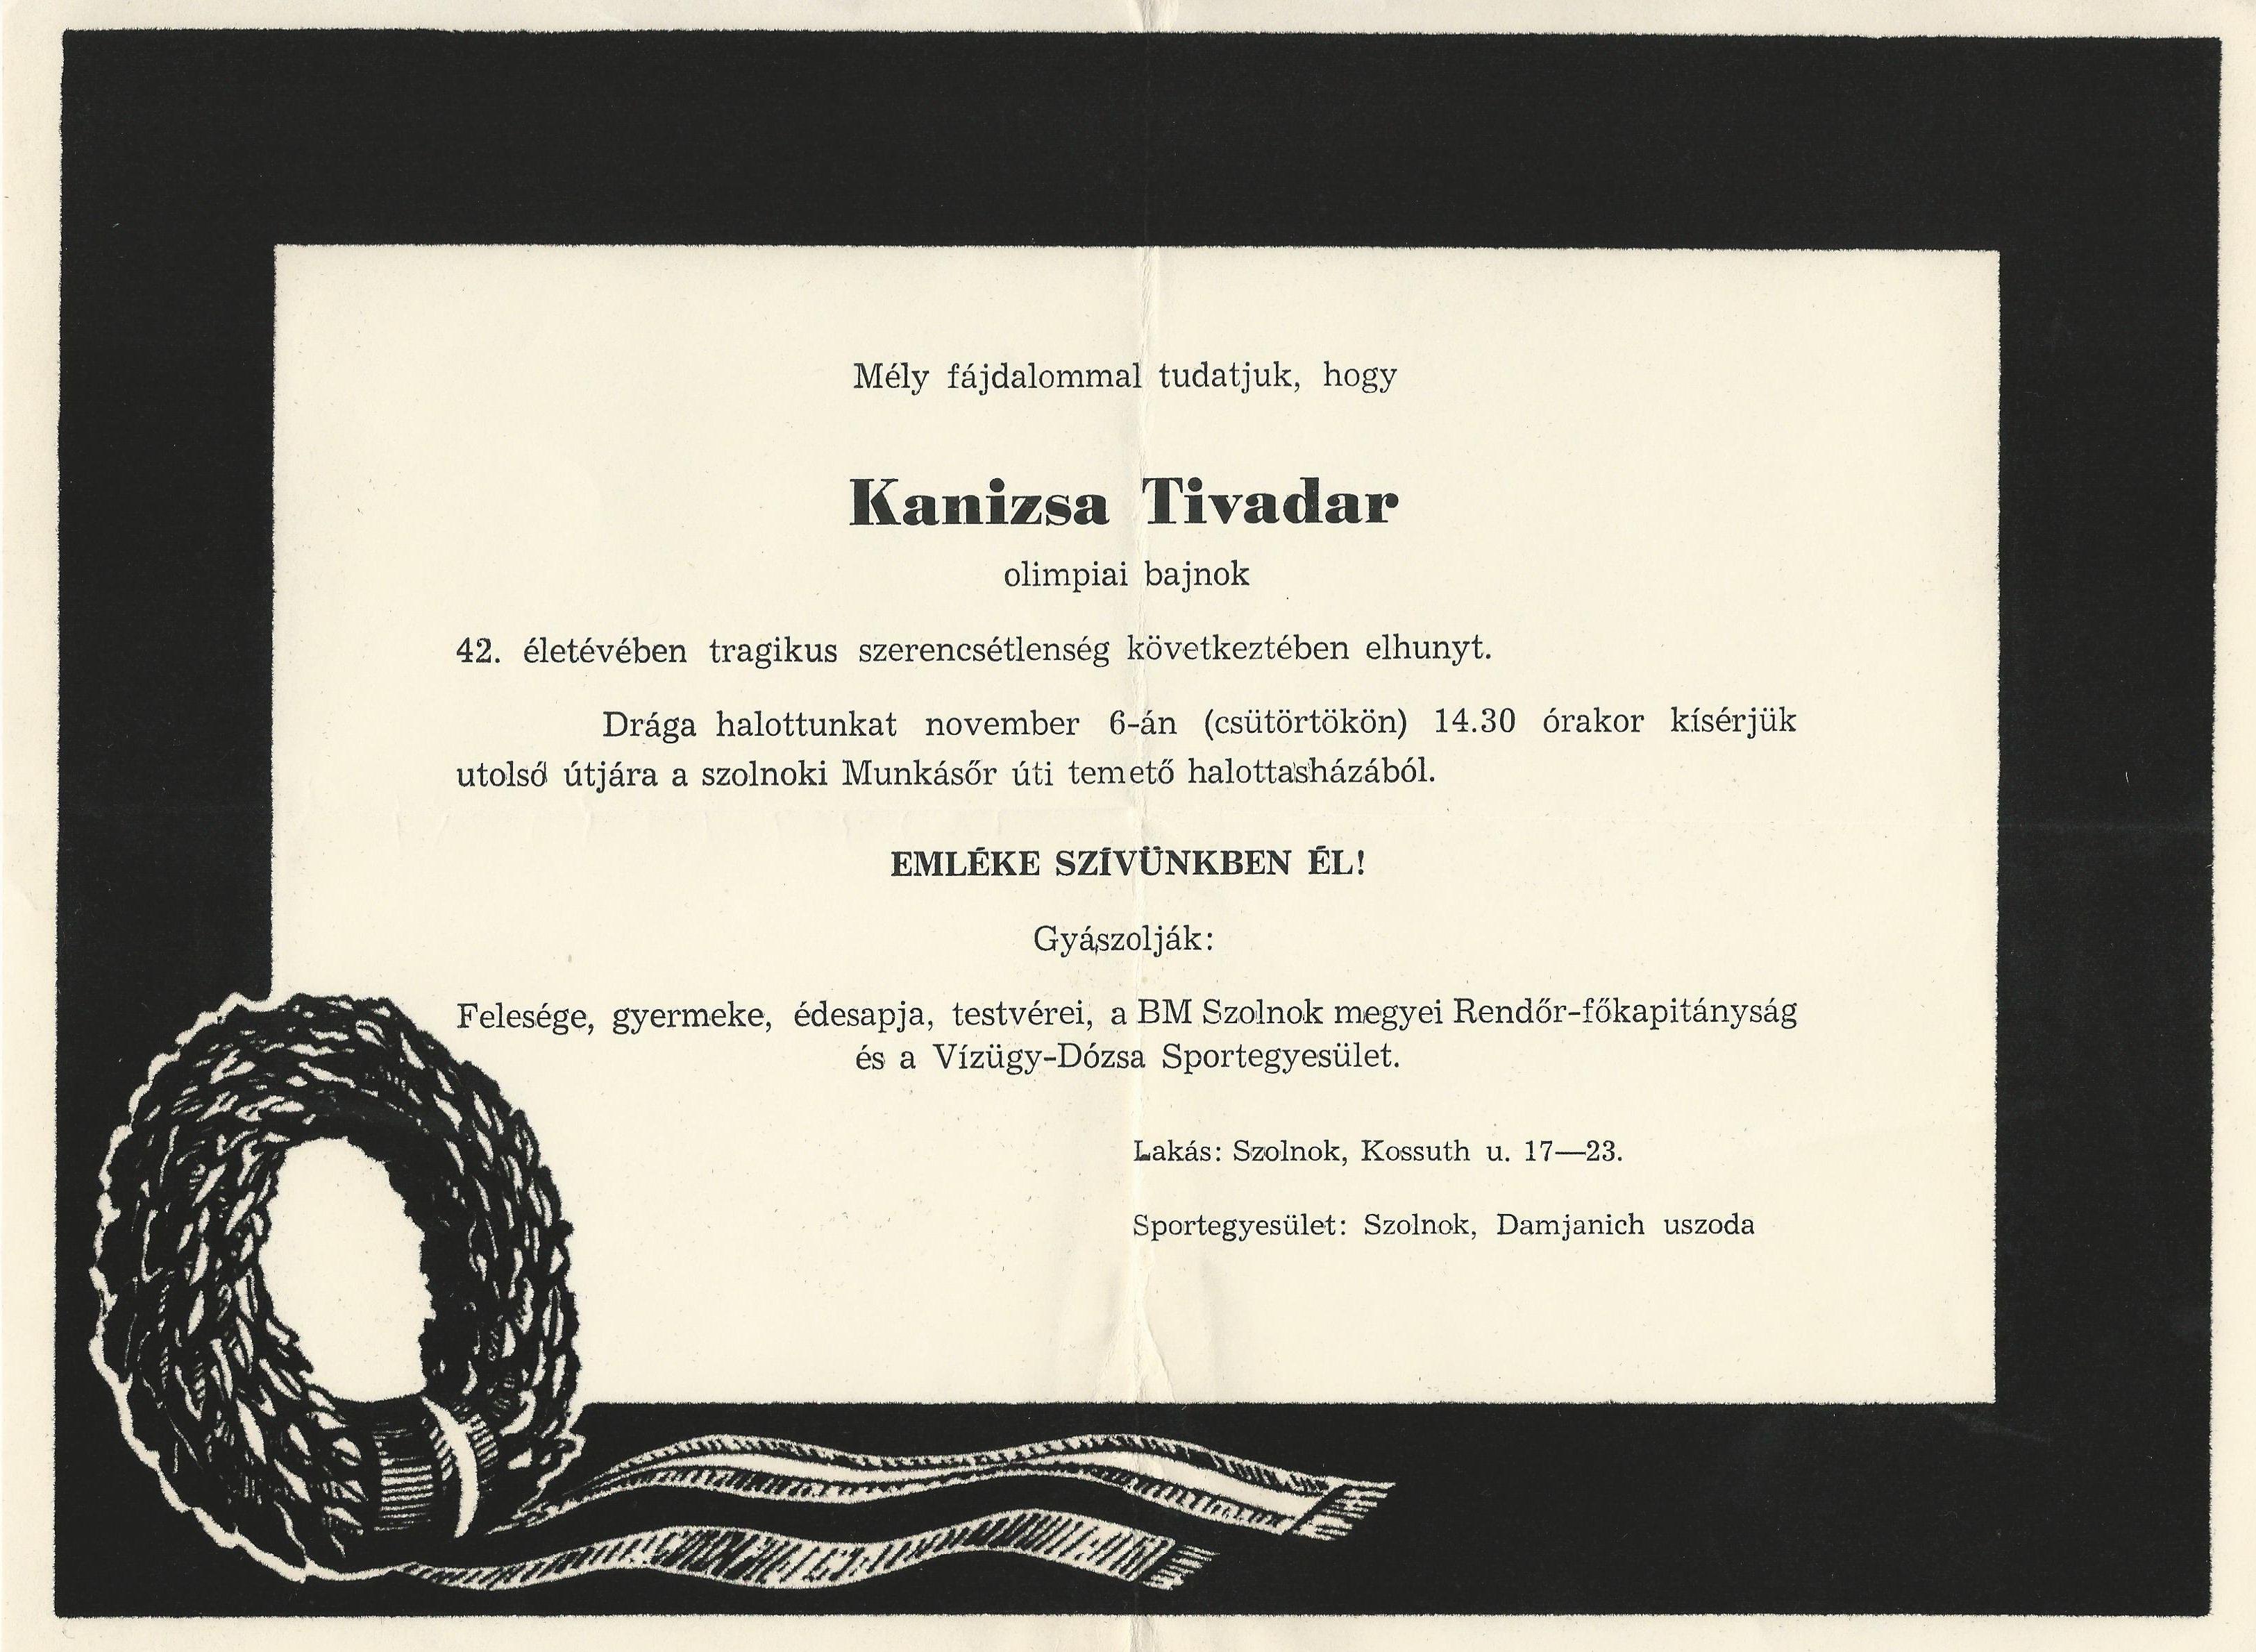 Kanizsai Tivadar